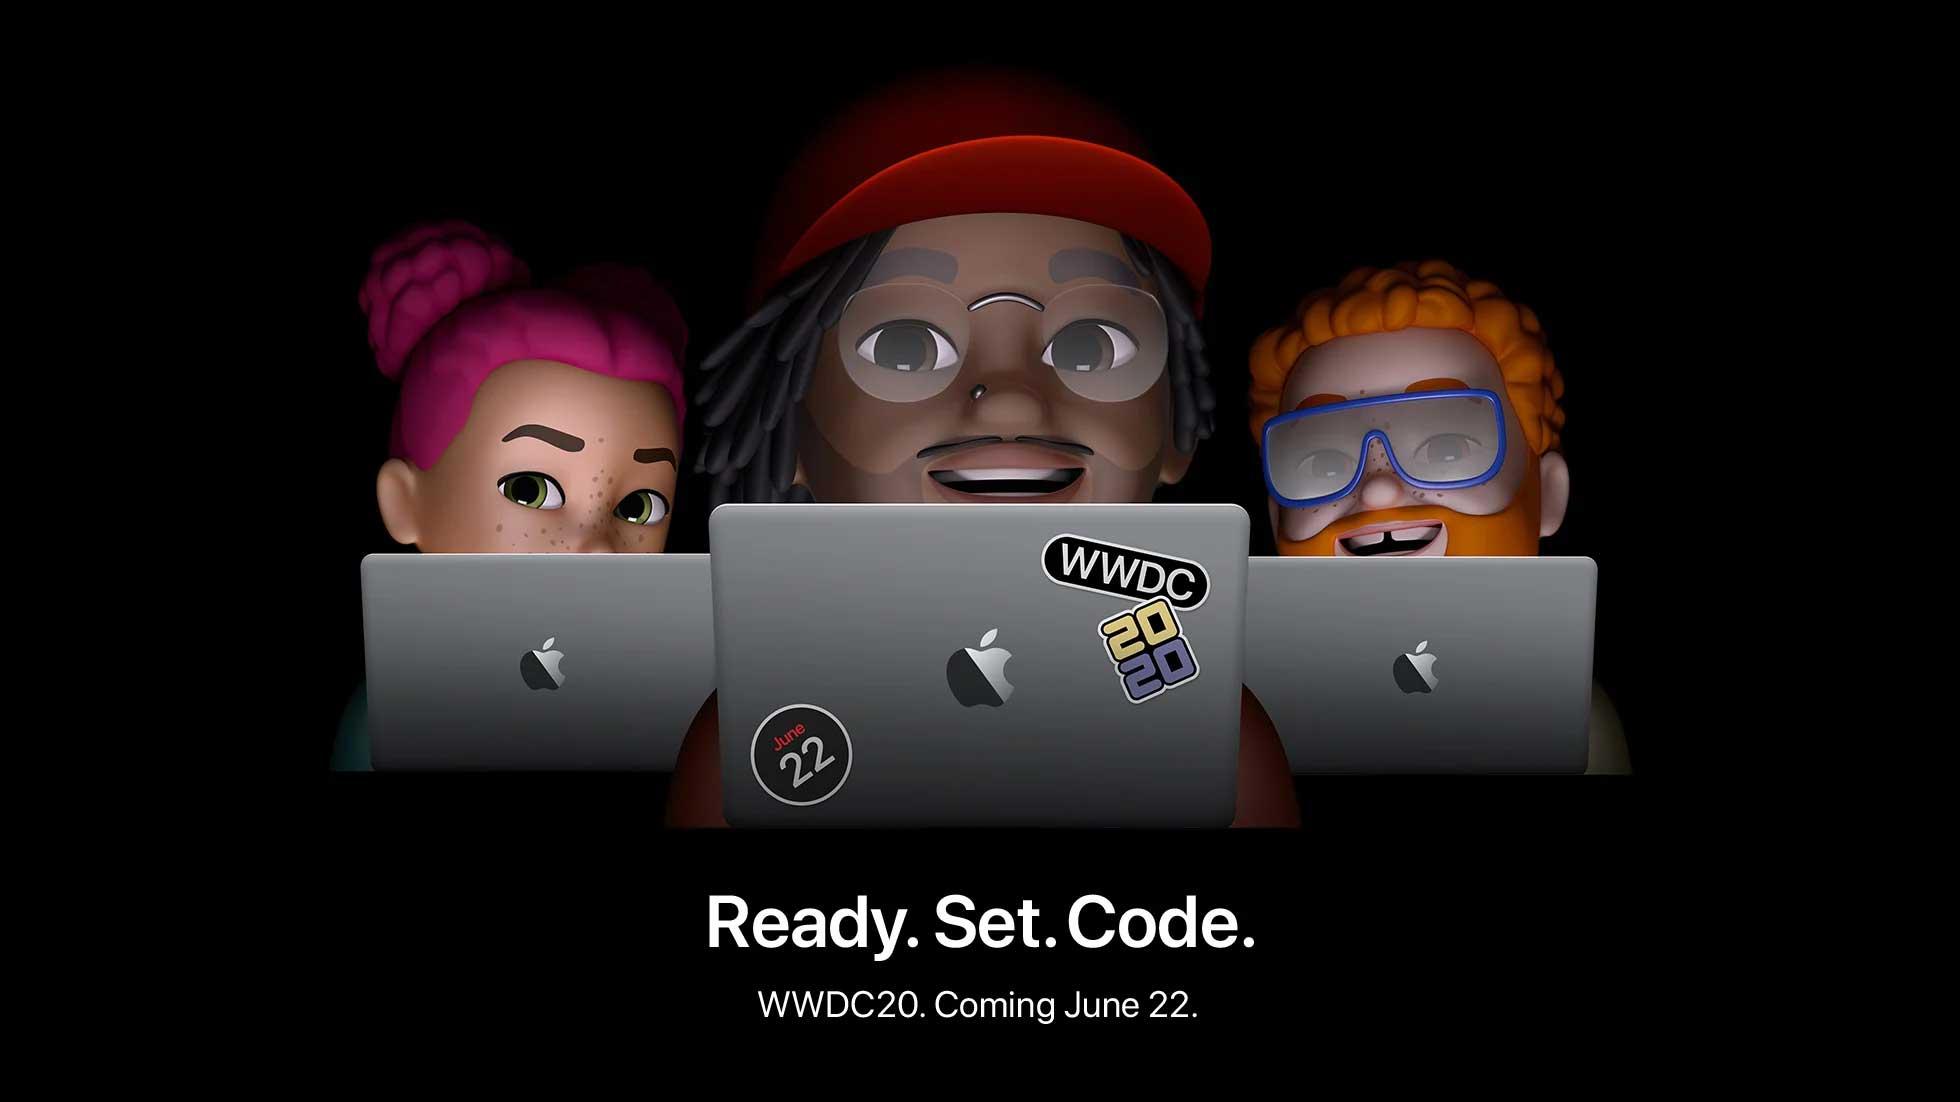 کنفرانس توسعه دهندگان اپل WWDC 2020